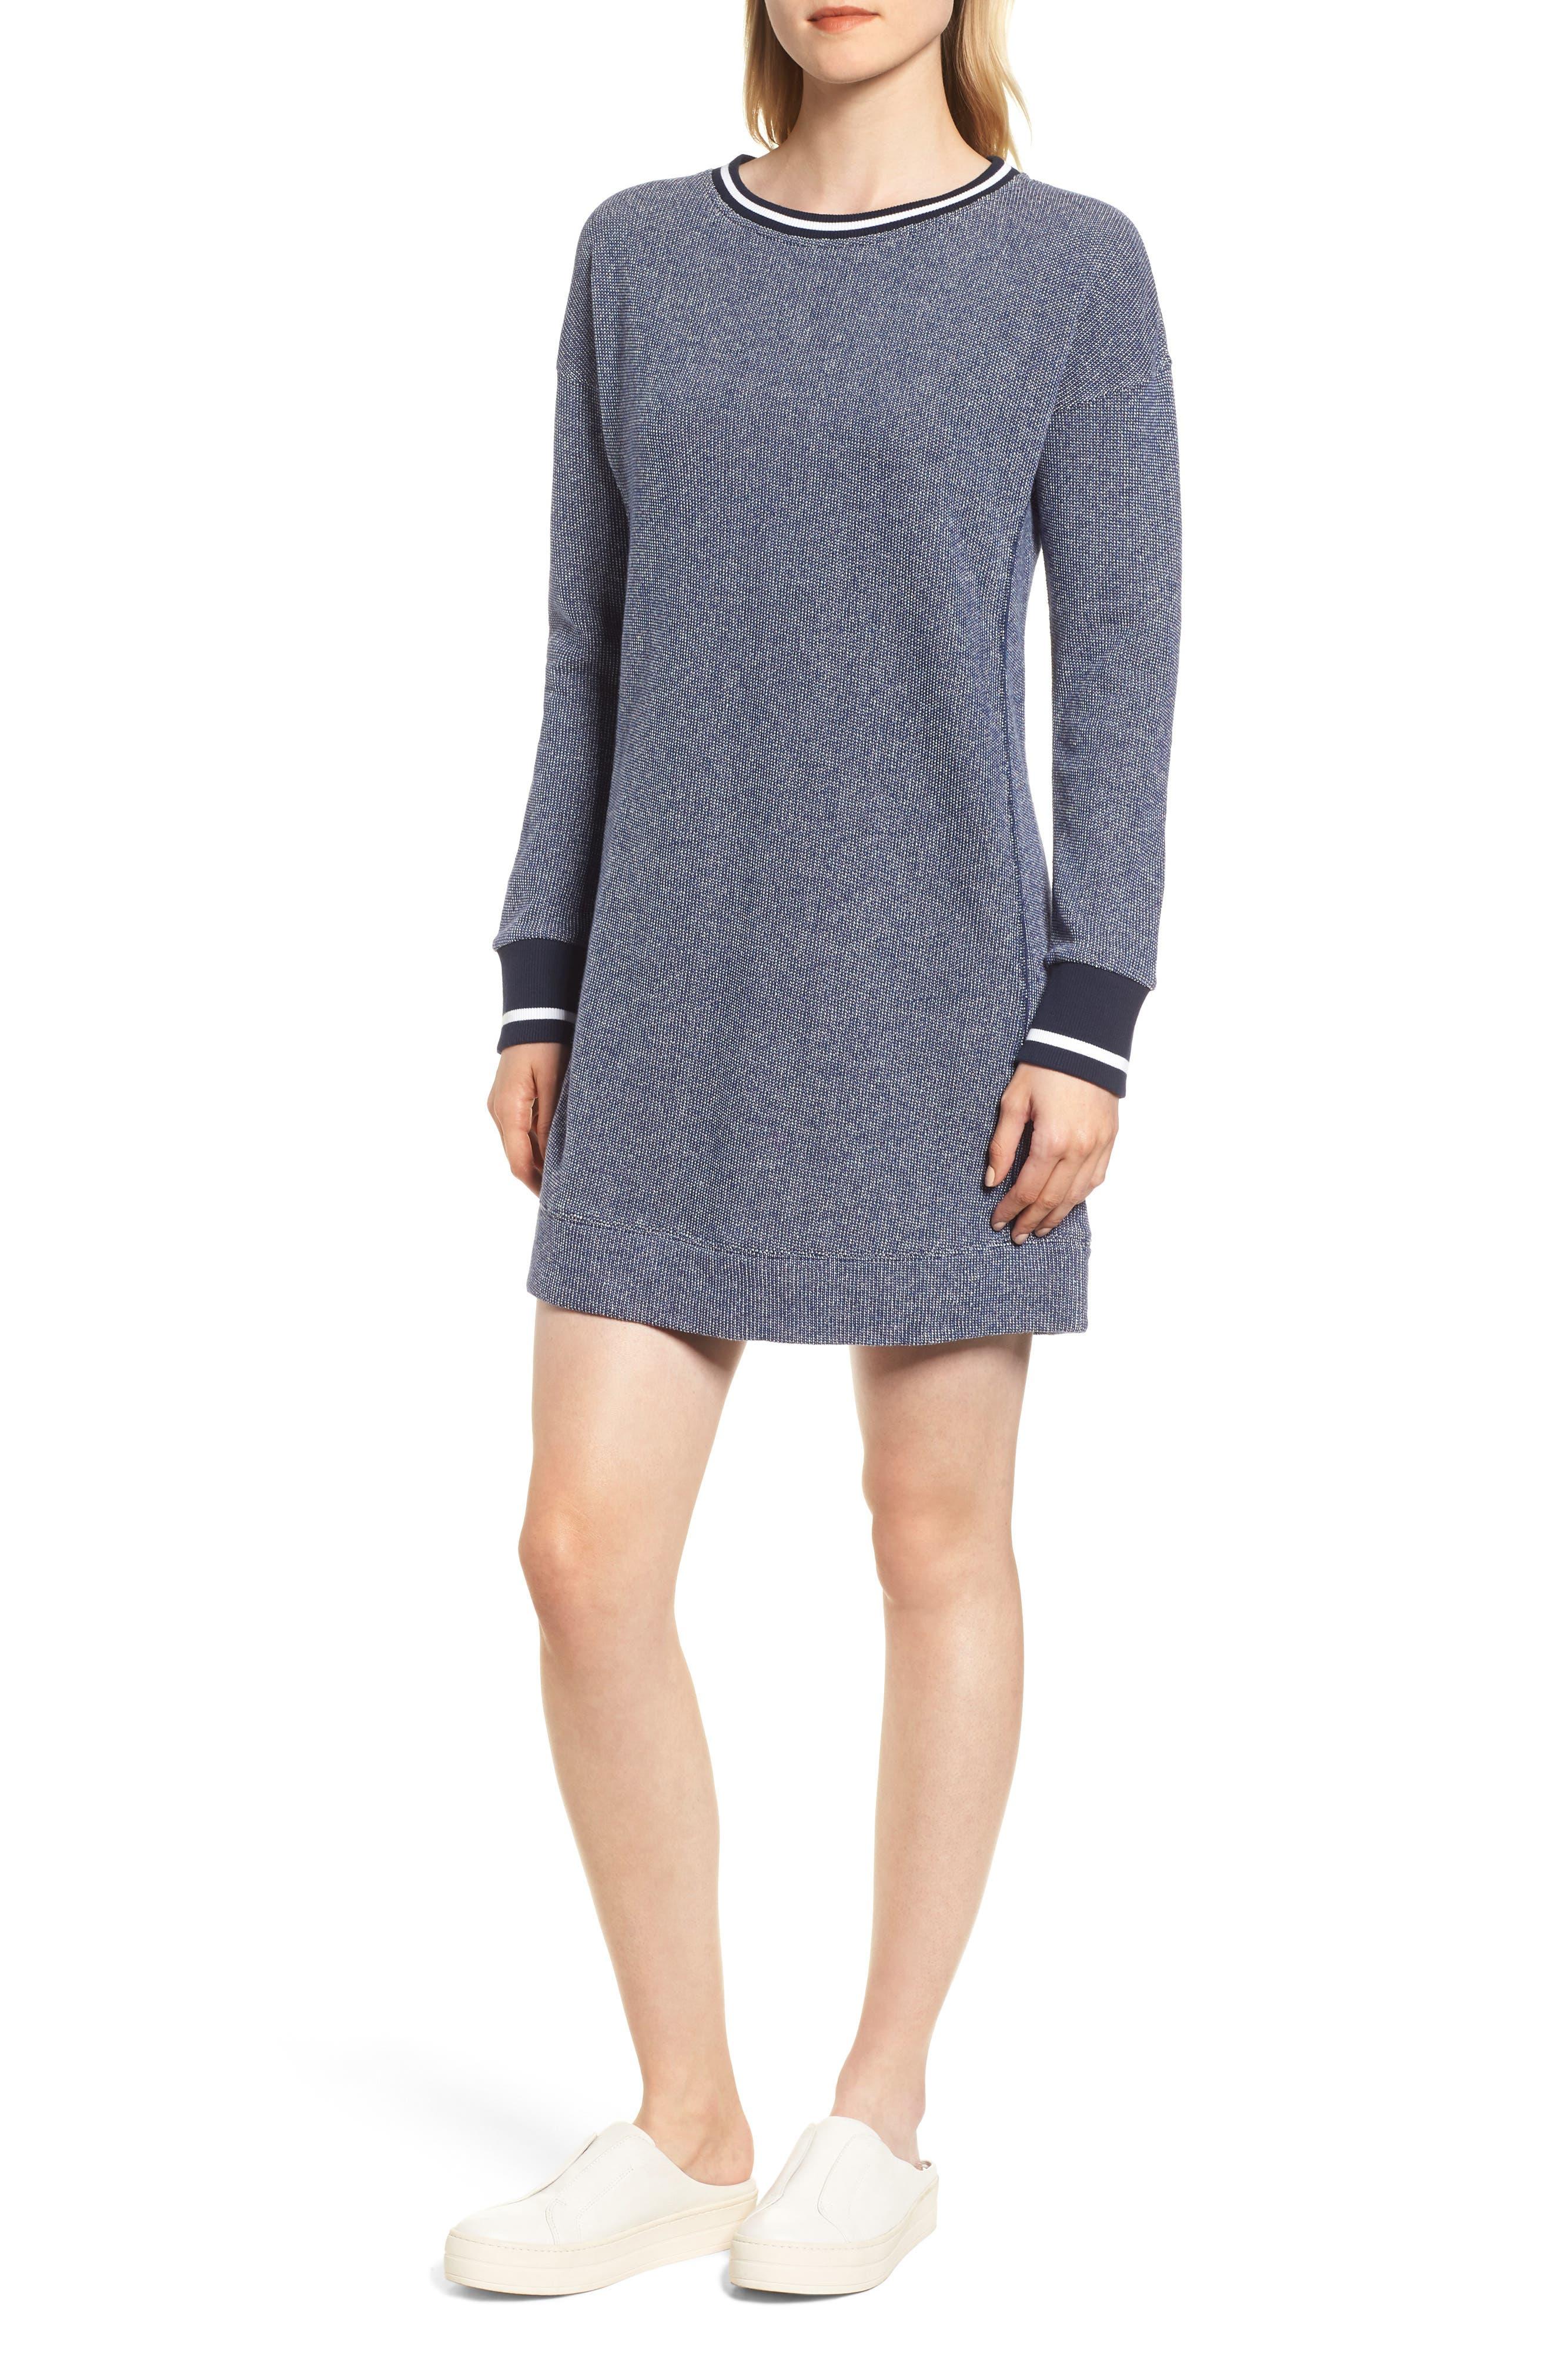 Sweatshirt Dress,                             Main thumbnail 1, color,                             476